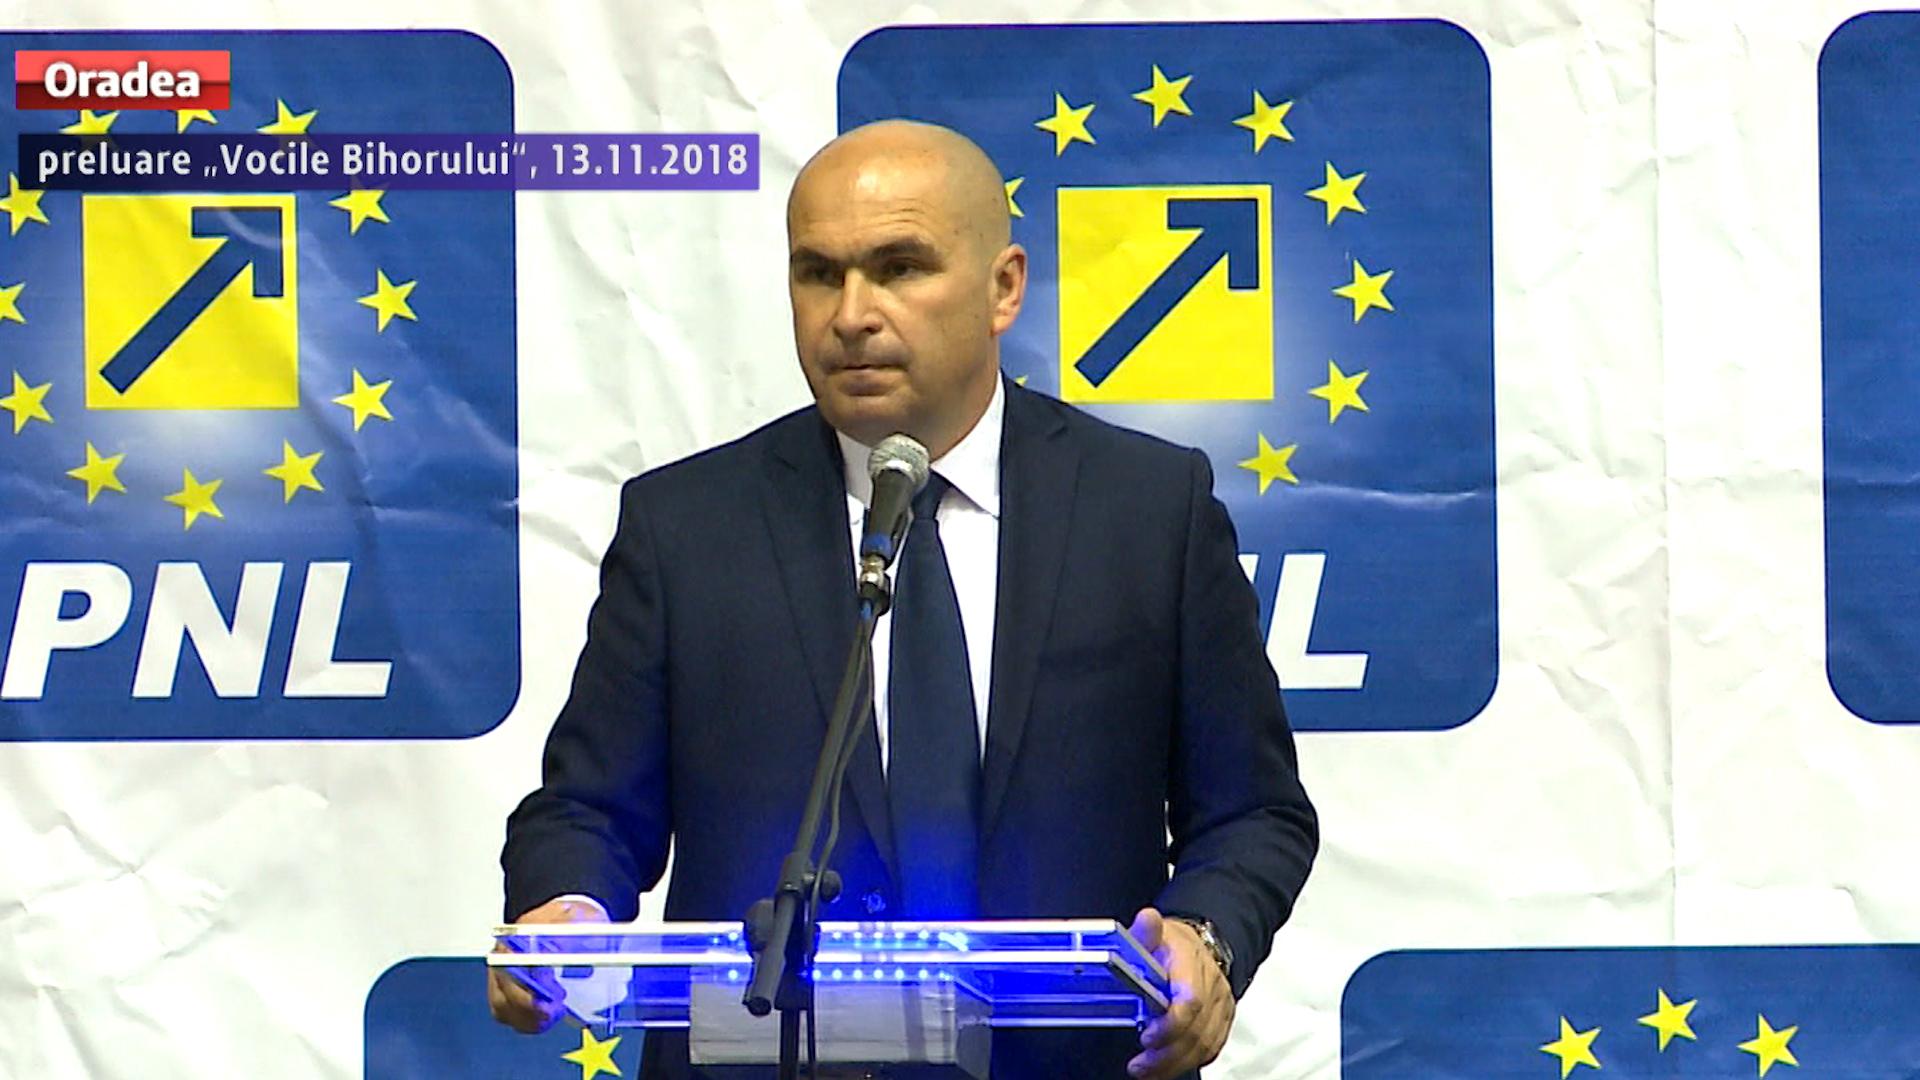 Ce a raspuns Ilie Bolojan cand a fost intrebat daca va candida si in 2020 la un nou mandat de primar al Oradei